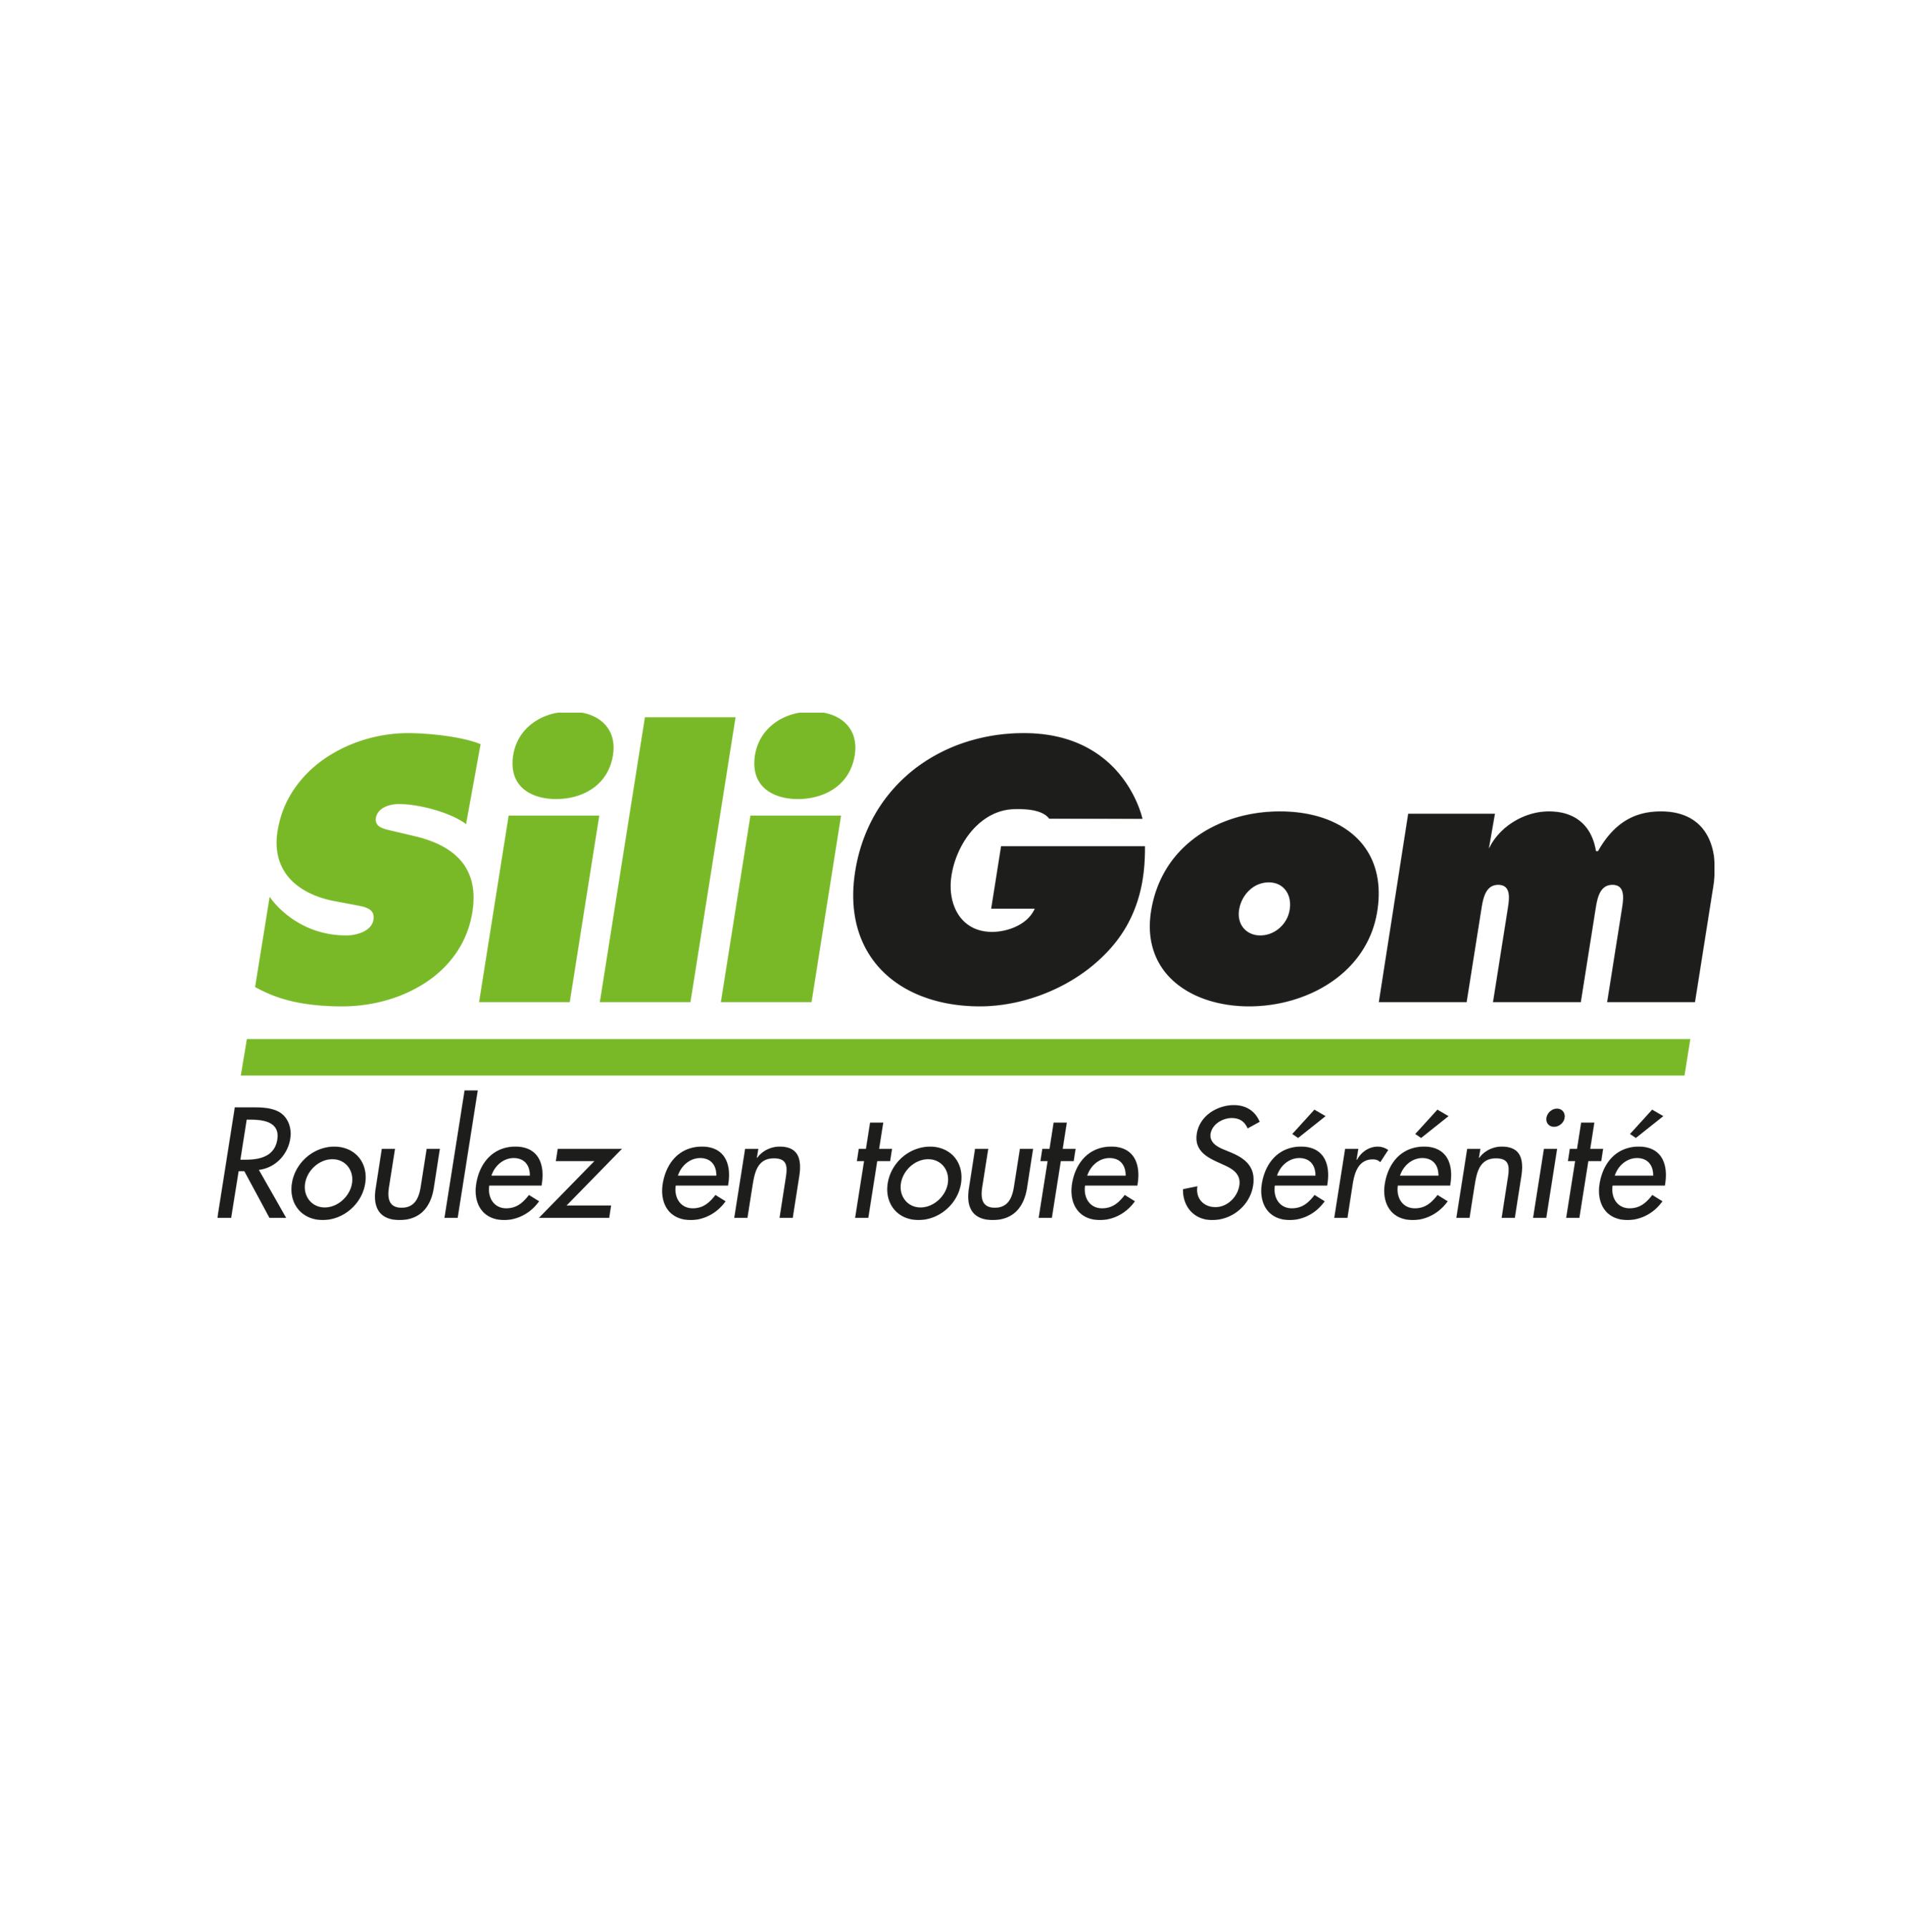 SILIGOM - BARGEON PNEUS LA TOUR DU PIN